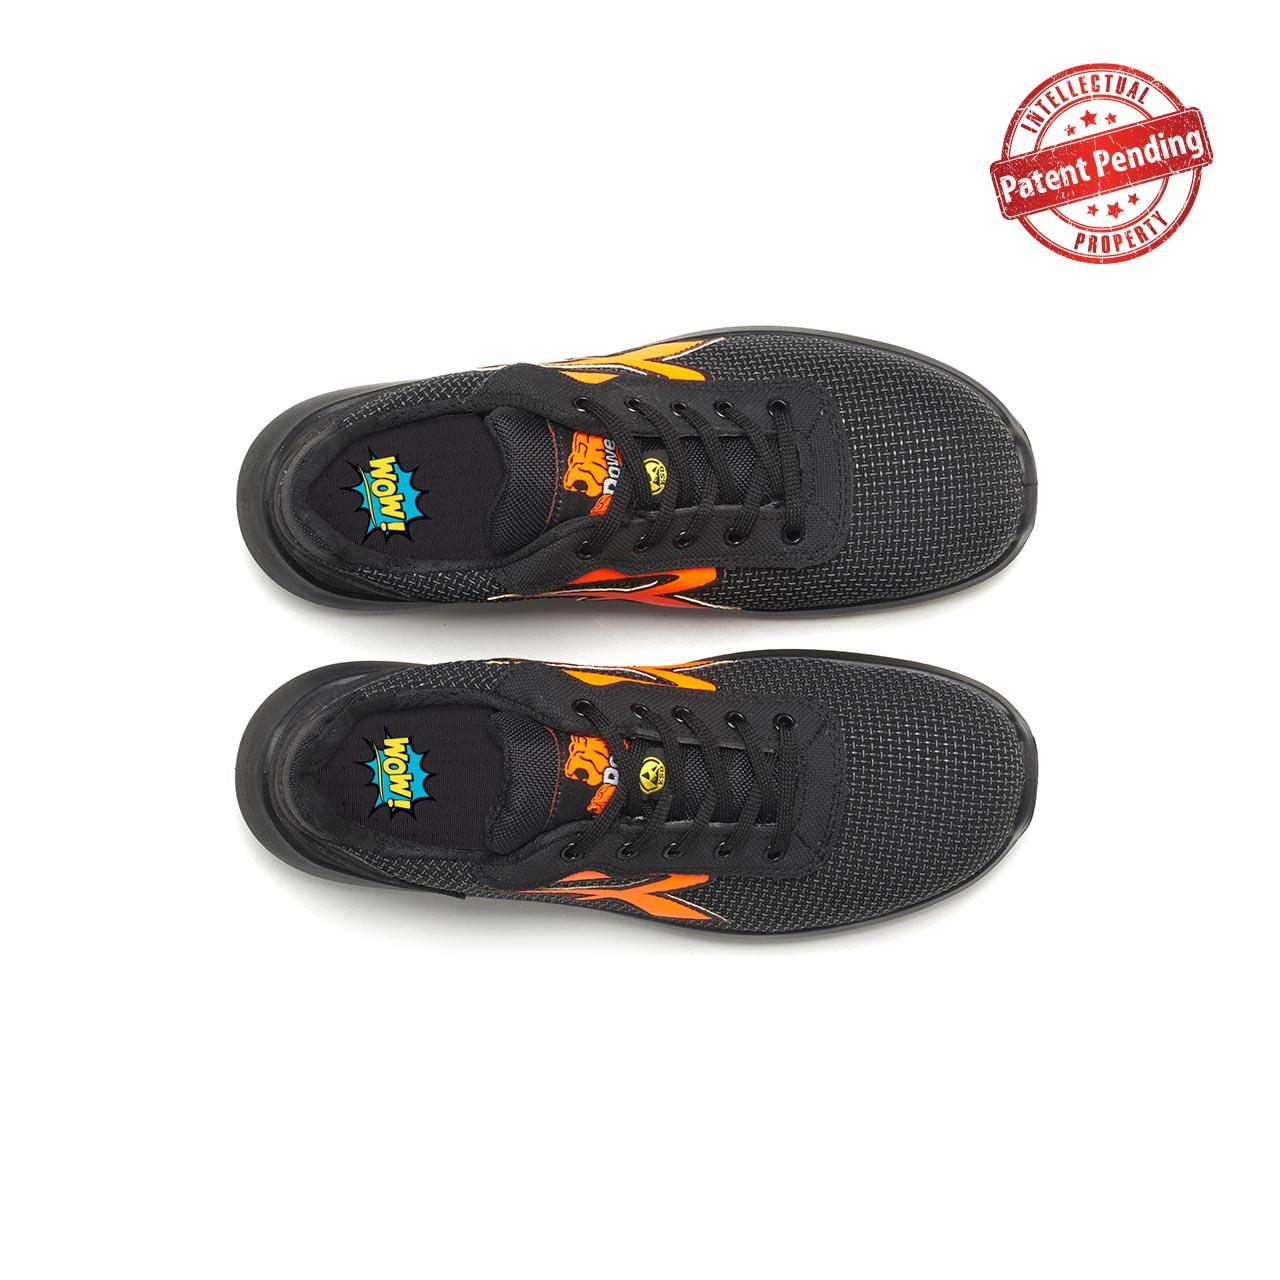 paio di scarpe antinfortunistiche upower modello taurus linea redup vista top